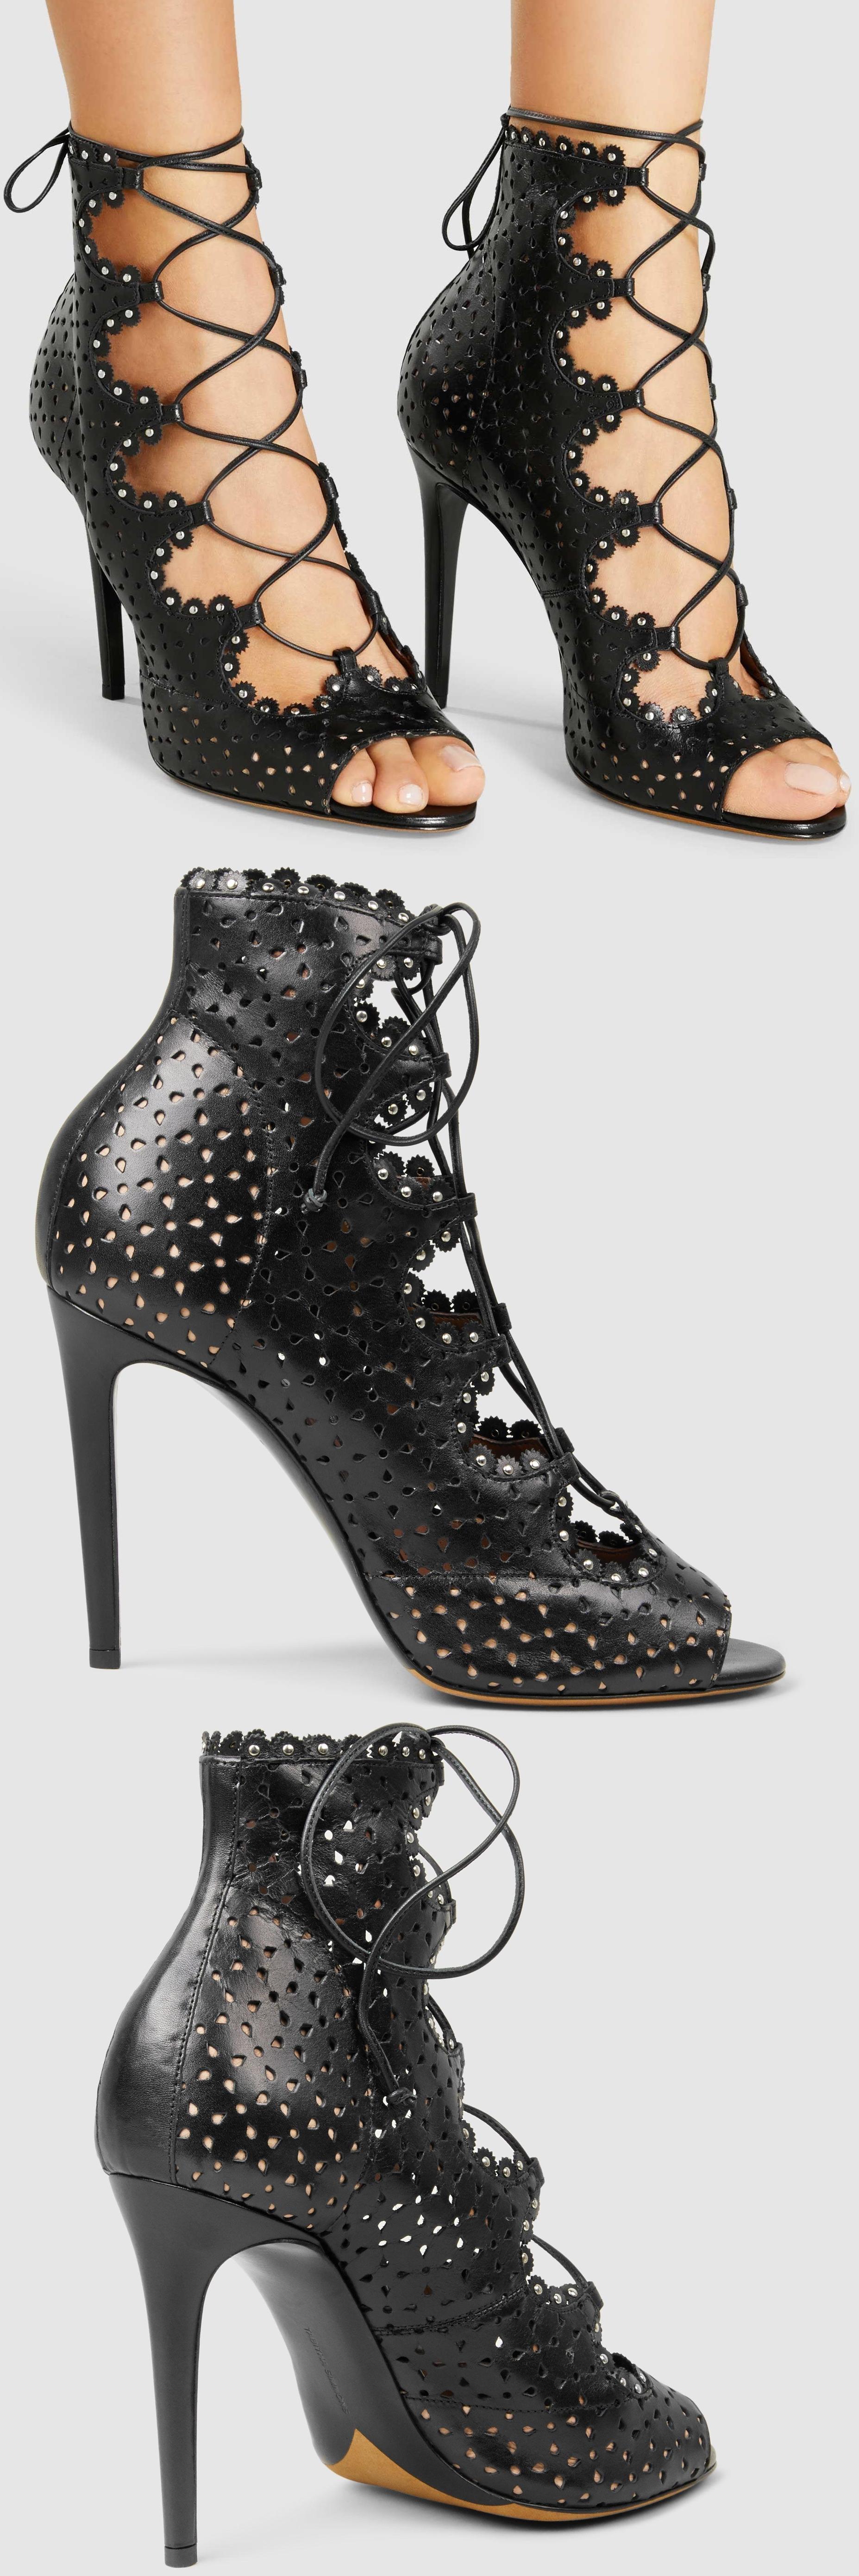 your next shoes on | peep toe pumps, femininity and hemline